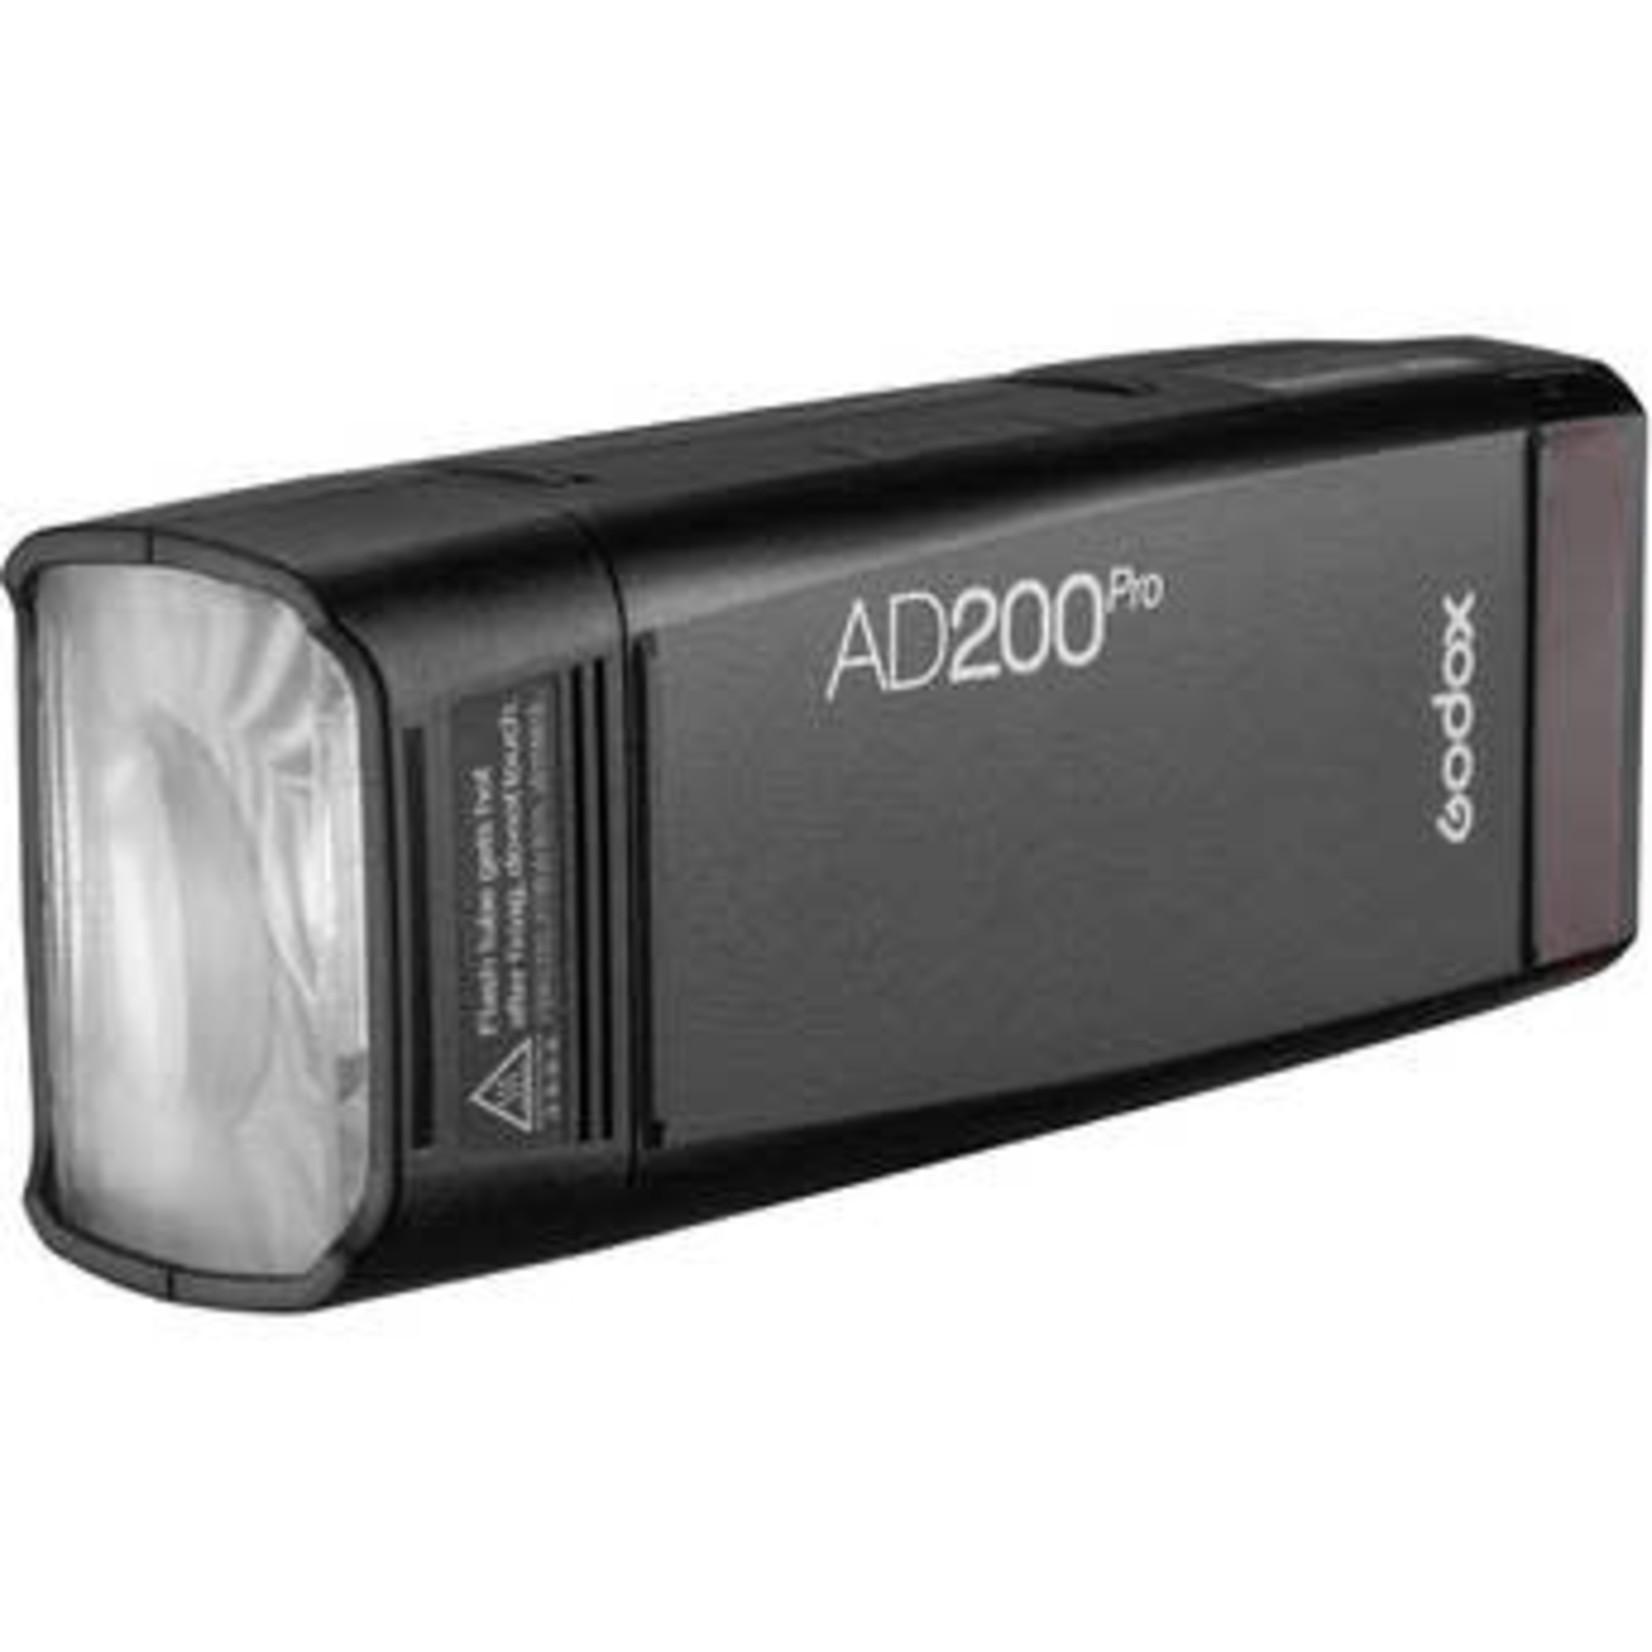 Godox Godox AD200 Pro 200 W/S TTL Pocket Flash Kit